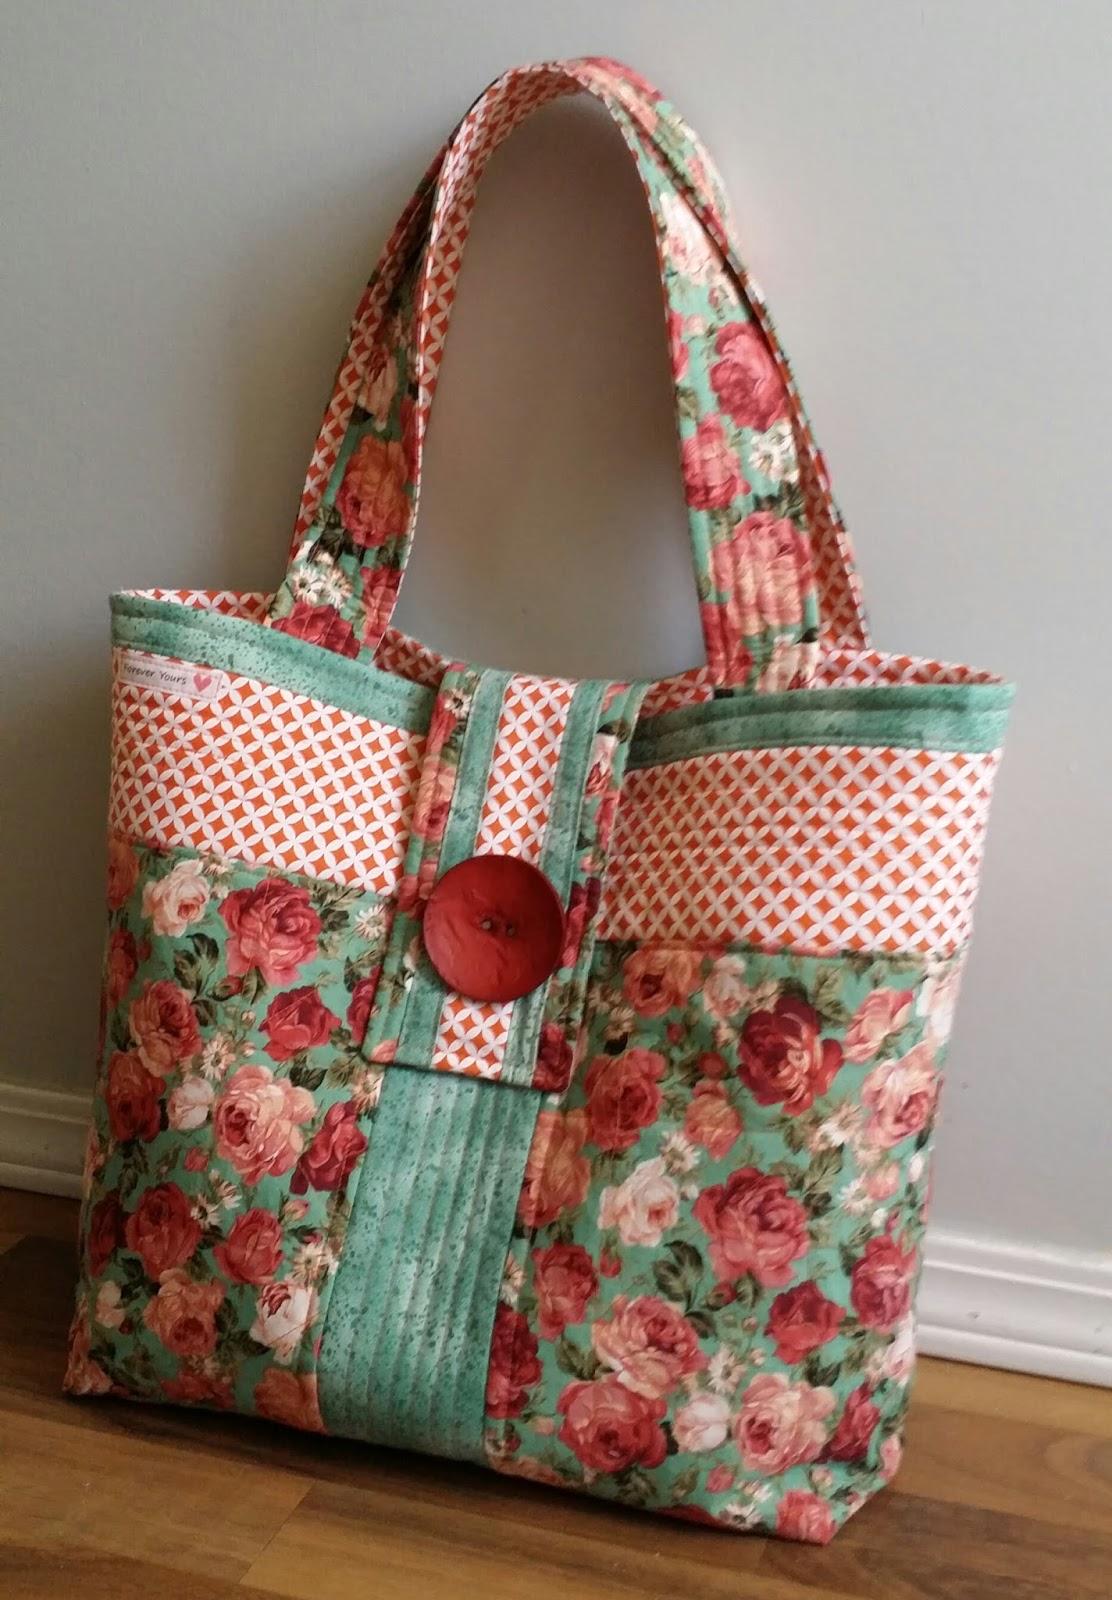 Quilted Knitting Bag Pattern Free : Novice Beginnings: Rose Fabric Tote Bag Tutorial